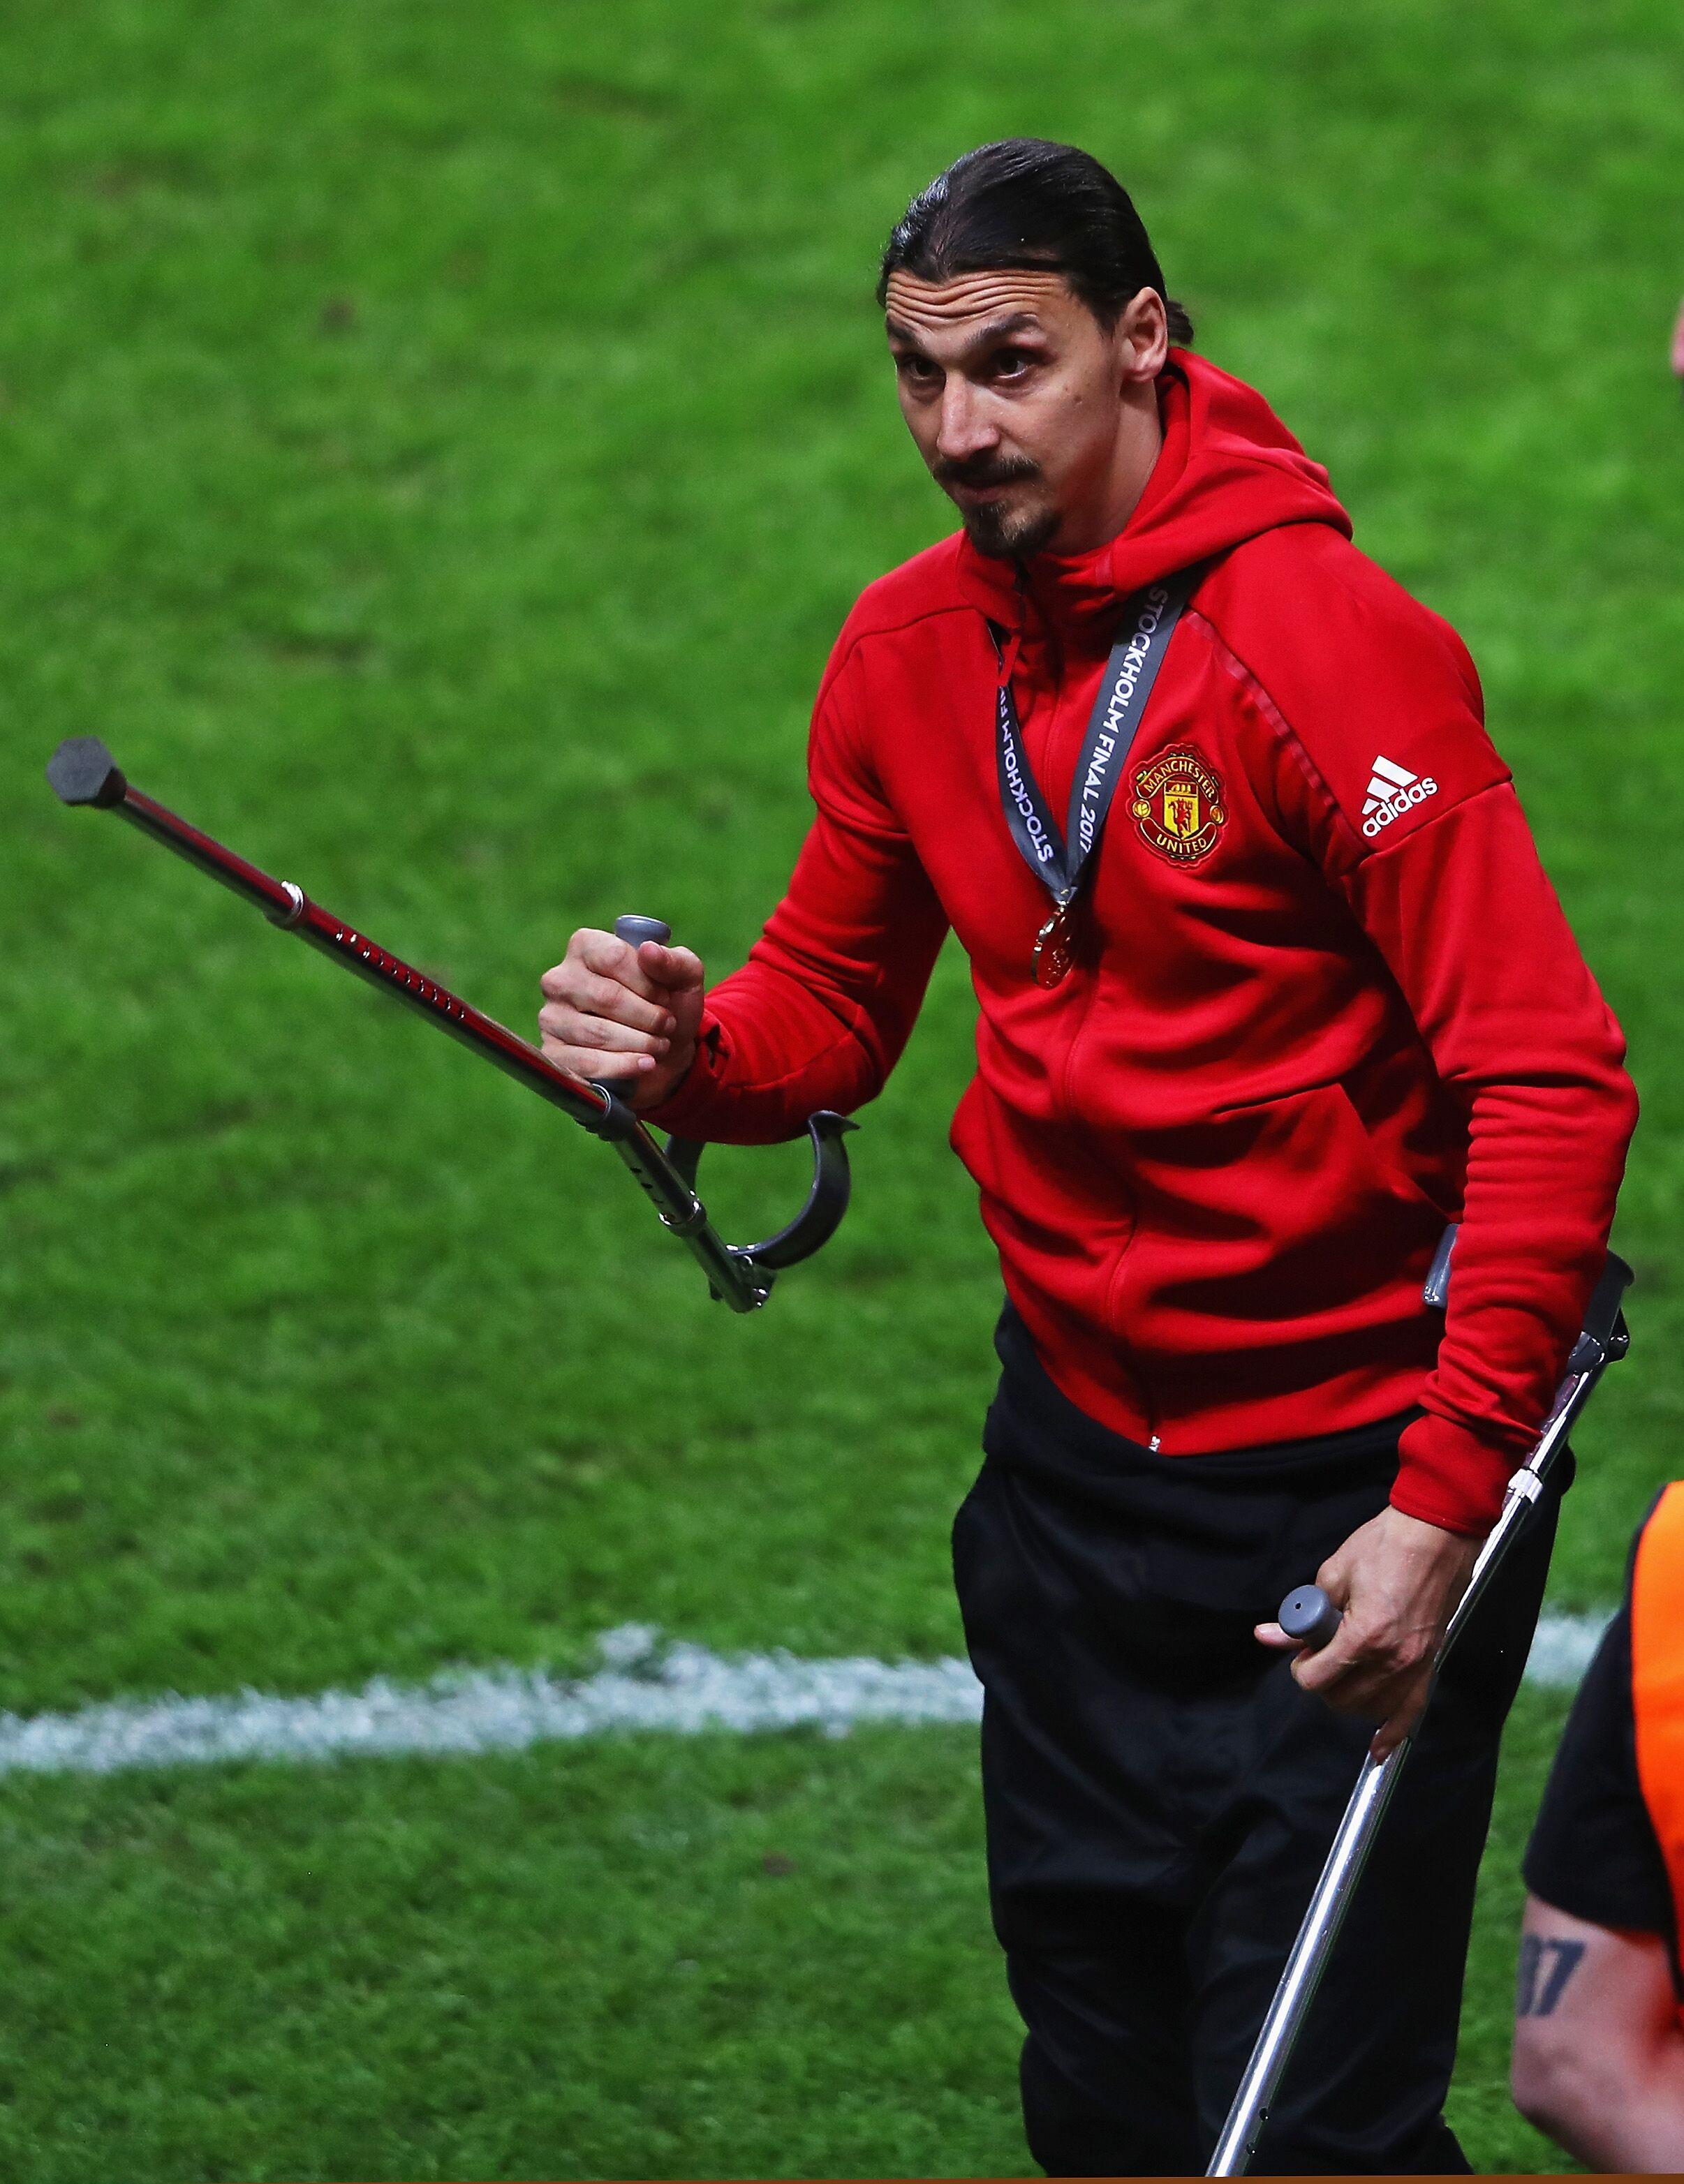 687906338-ajax-v-manchester-united-uefa-europa-league-final.jpg